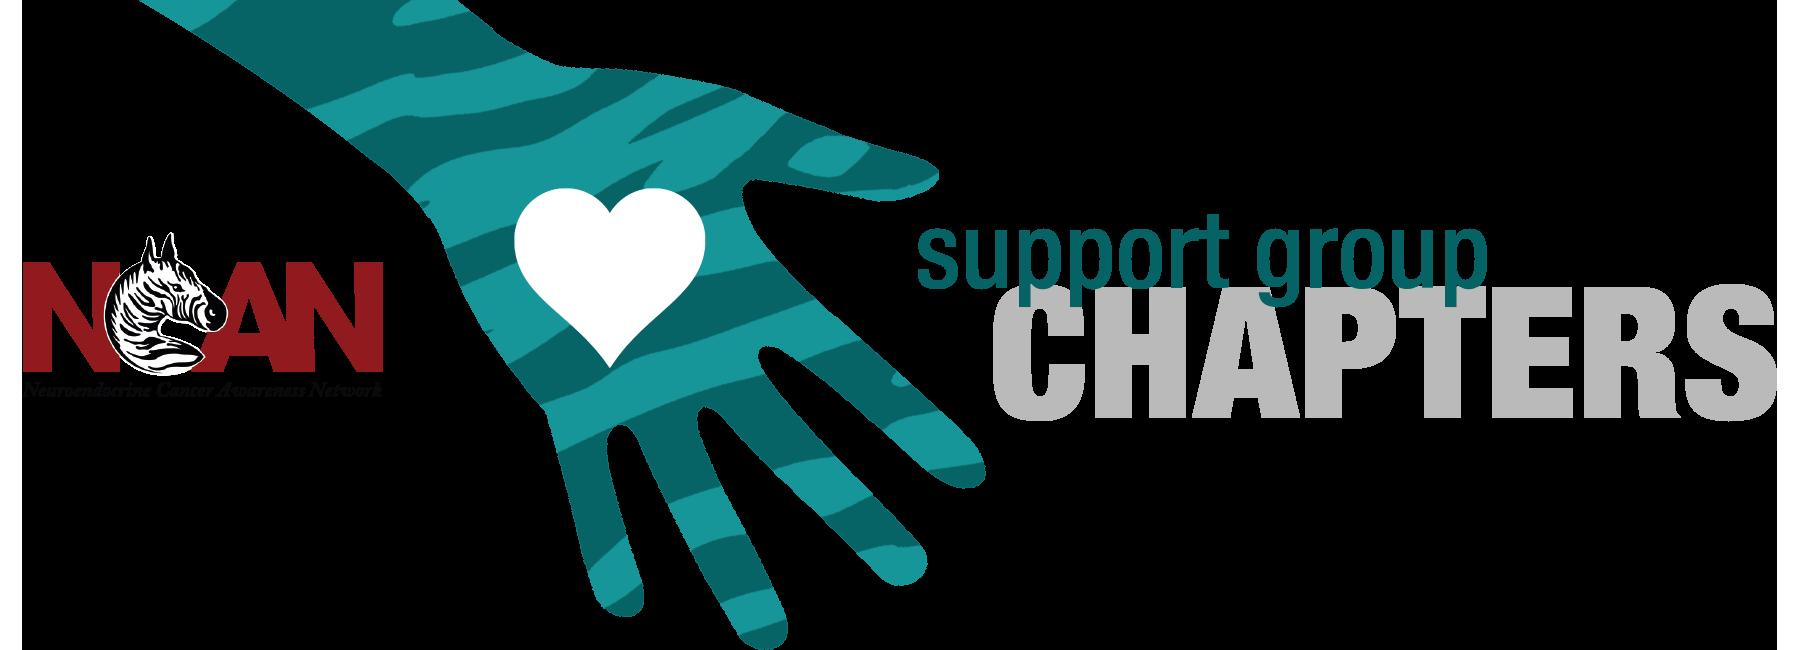 NCAN Support Group-Carolinas-Charleston Chapter